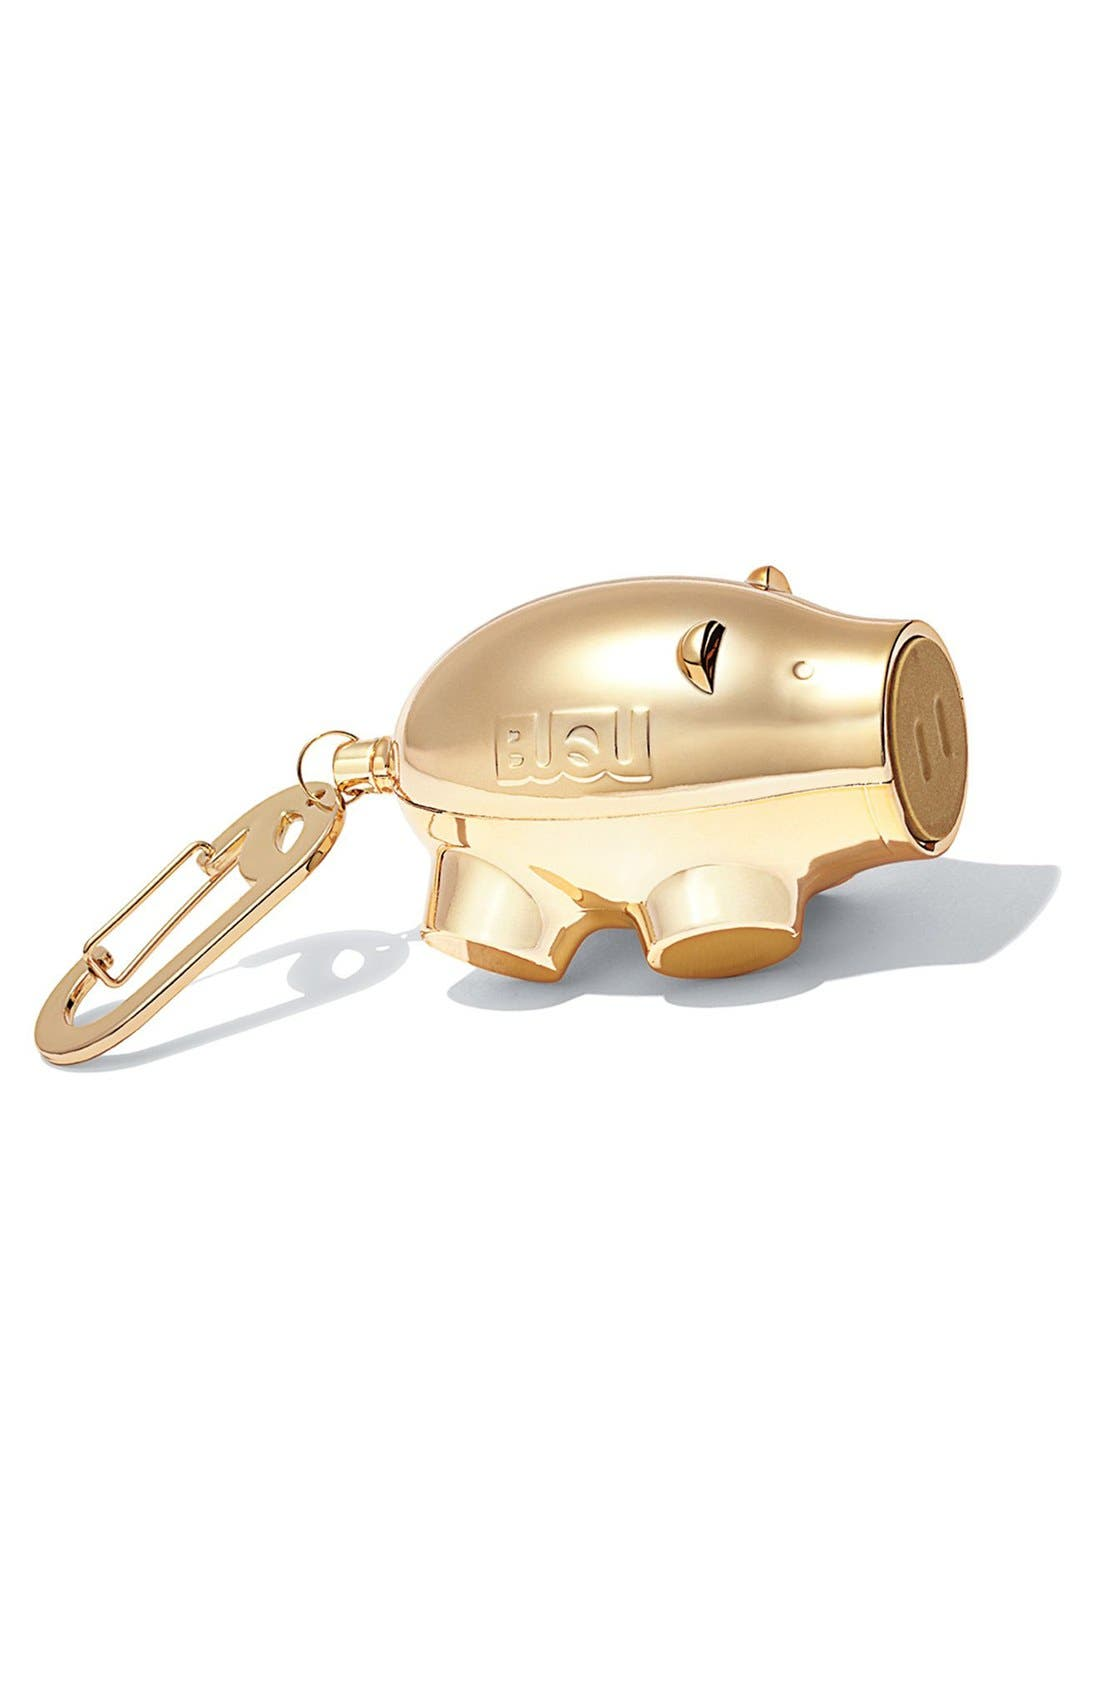 Buqu Tech 'Chubs' Piggy Shaped USB Power Bank,                             Main thumbnail 1, color,                             710